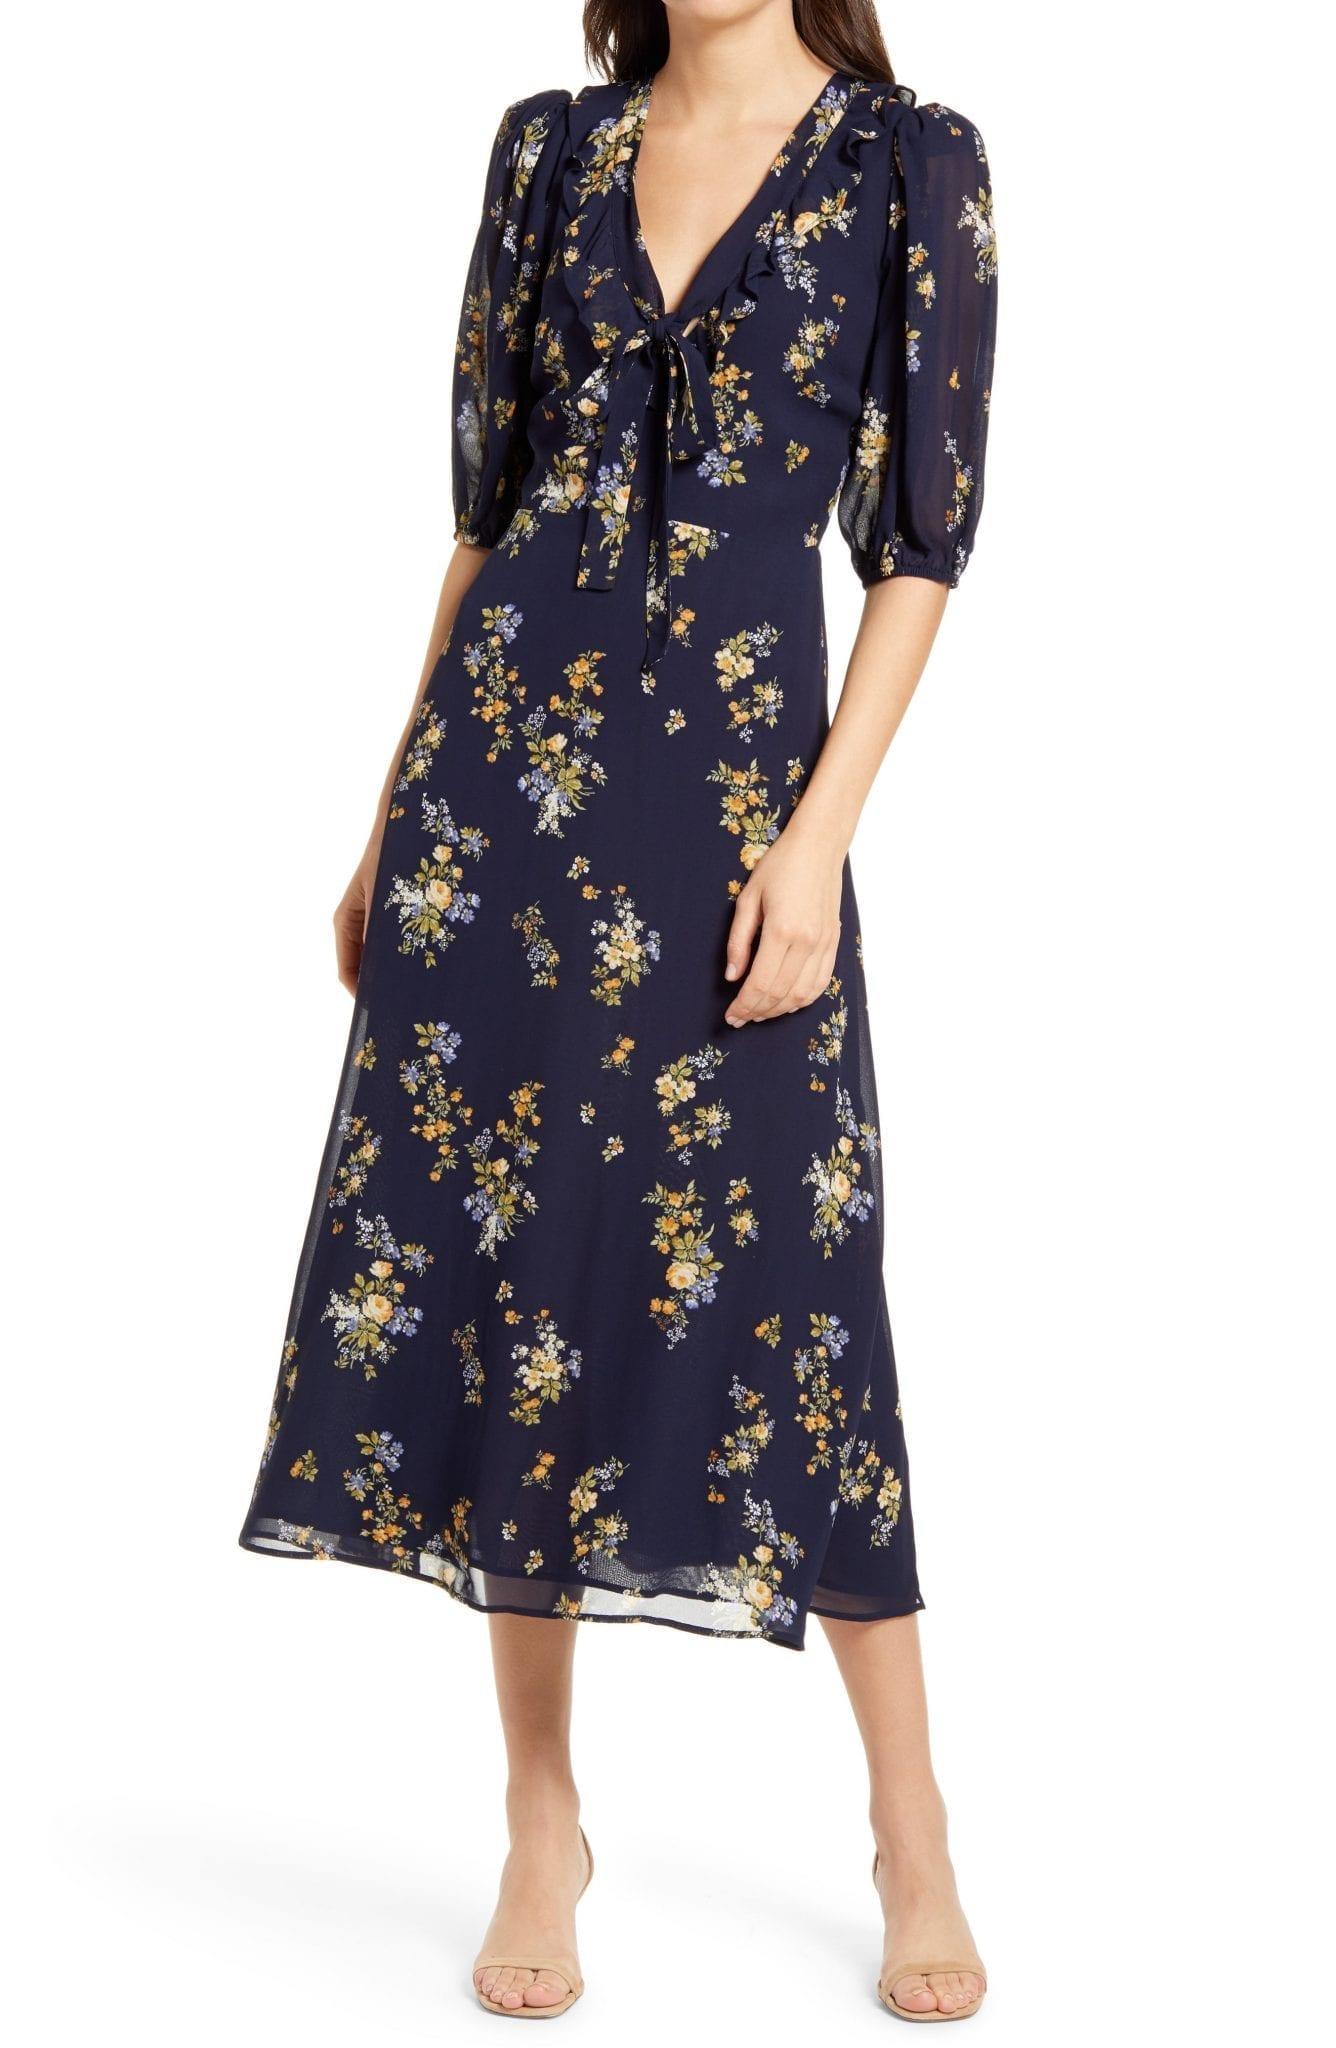 REFORMATION Brook Floral Print Tie Neck Dress